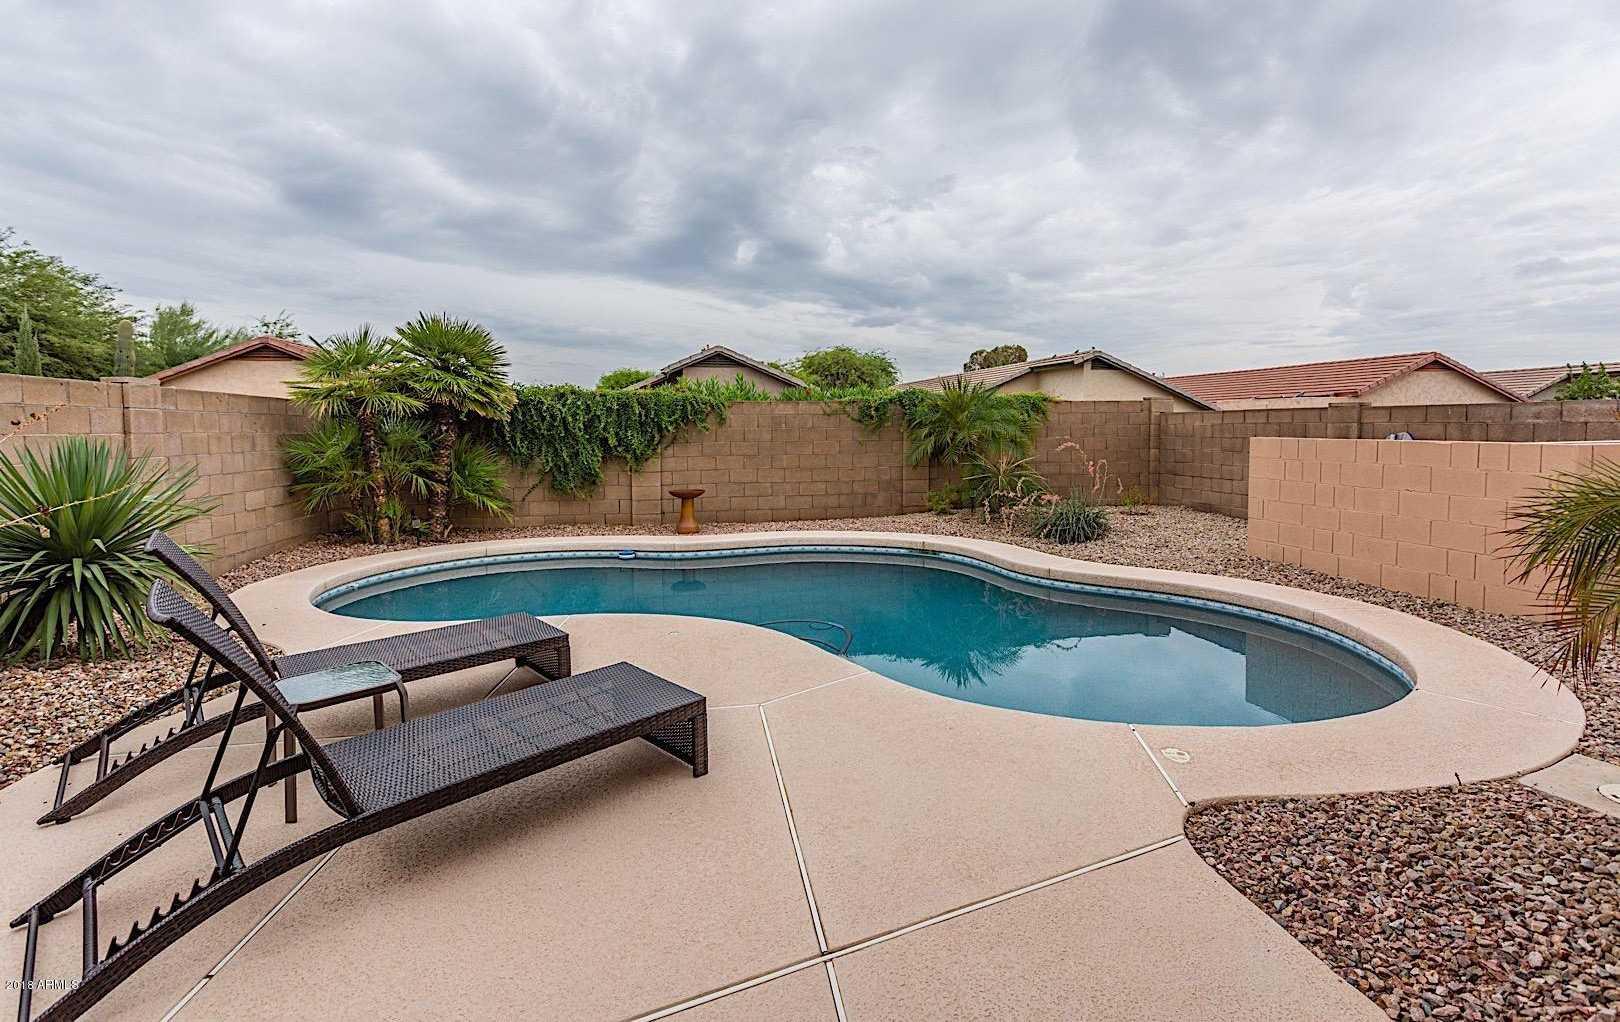 - 3Br/2Ba - Home for Sale in Desert Ridge Parcel 7.1, Phoenix